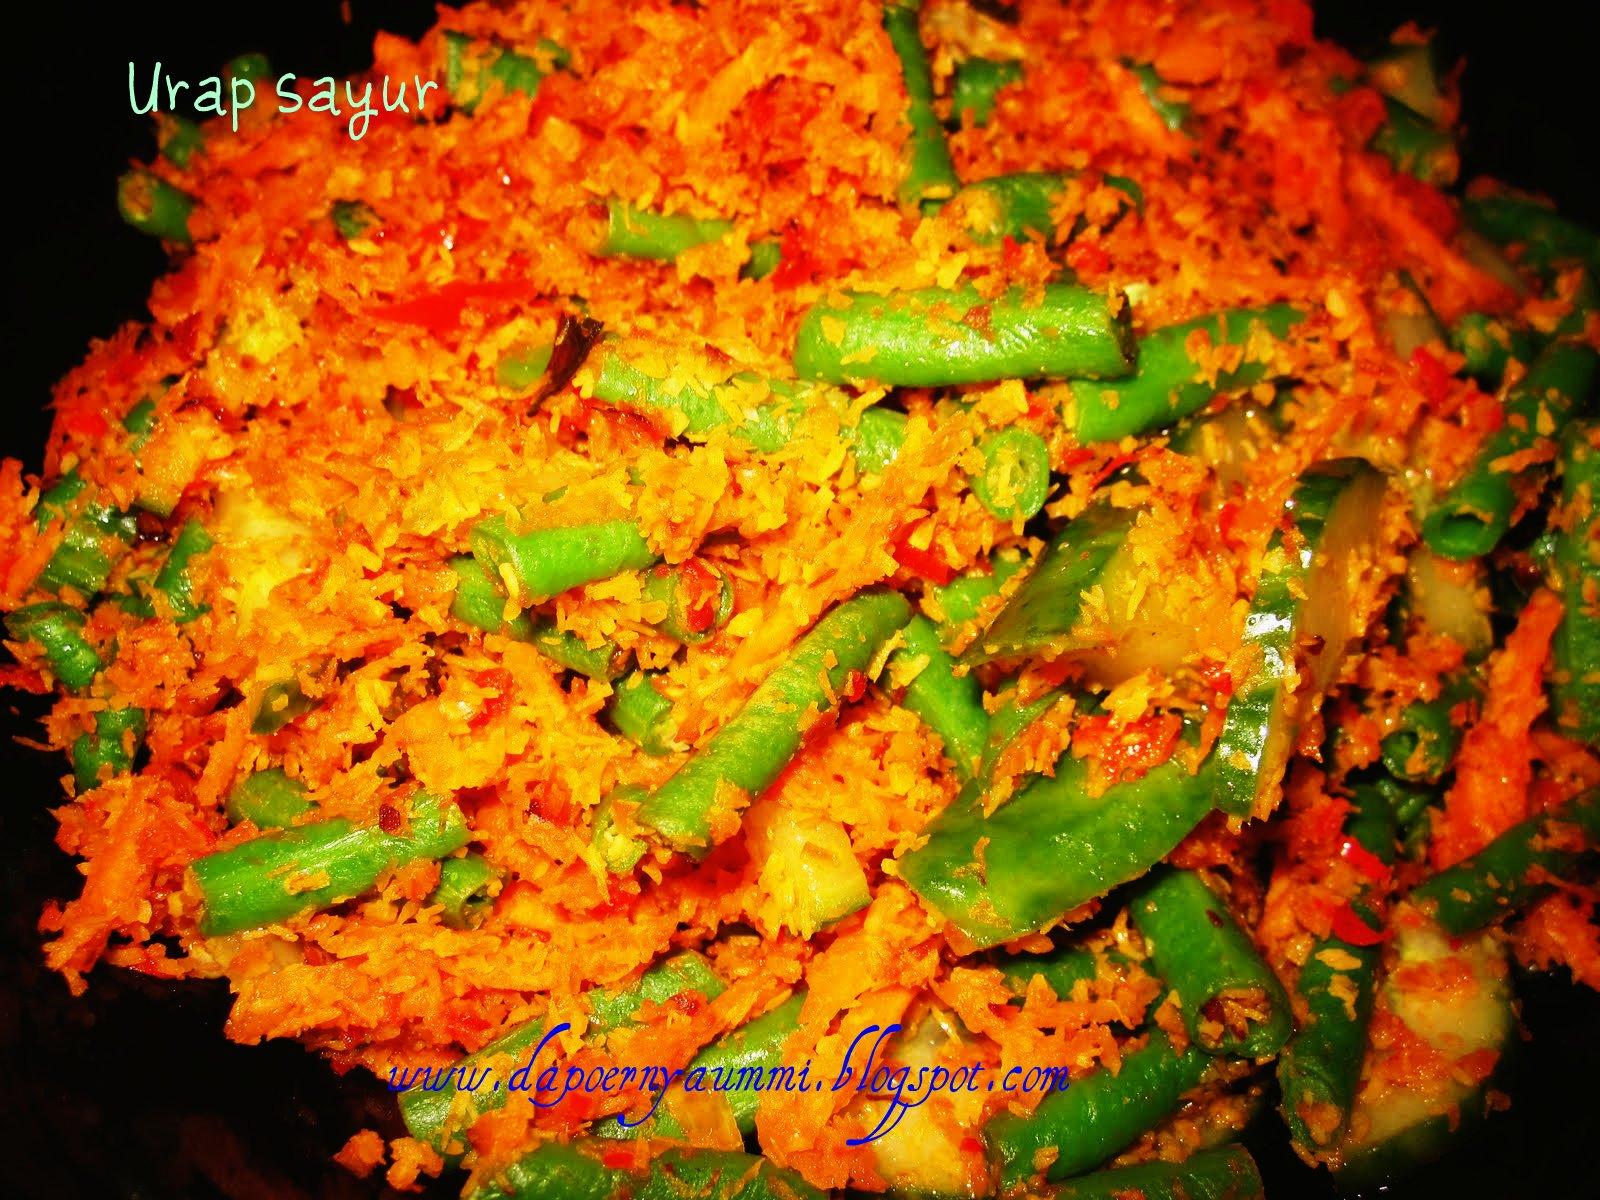 Resep Urap Sayuran Resep Masakan Indonesia Praktis | Share The ...